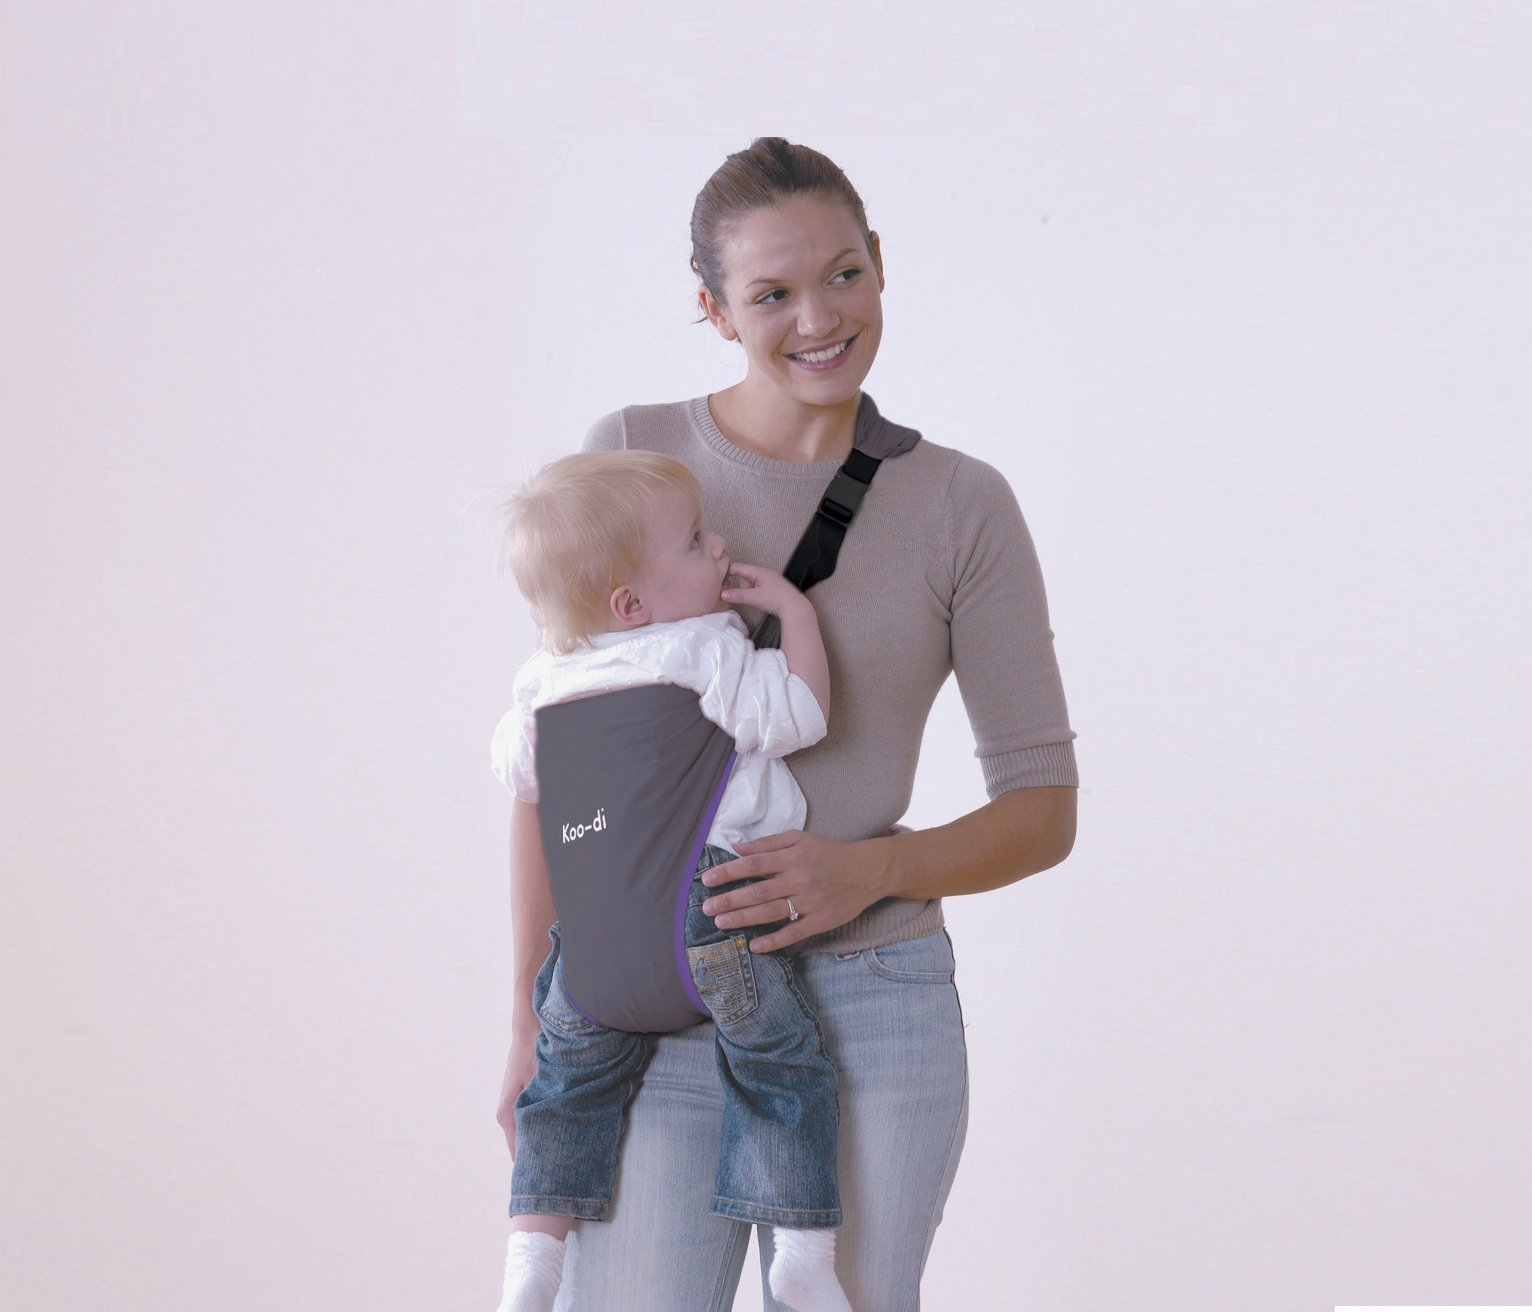 Koo-di Pack-It Hip Carrier - Grey